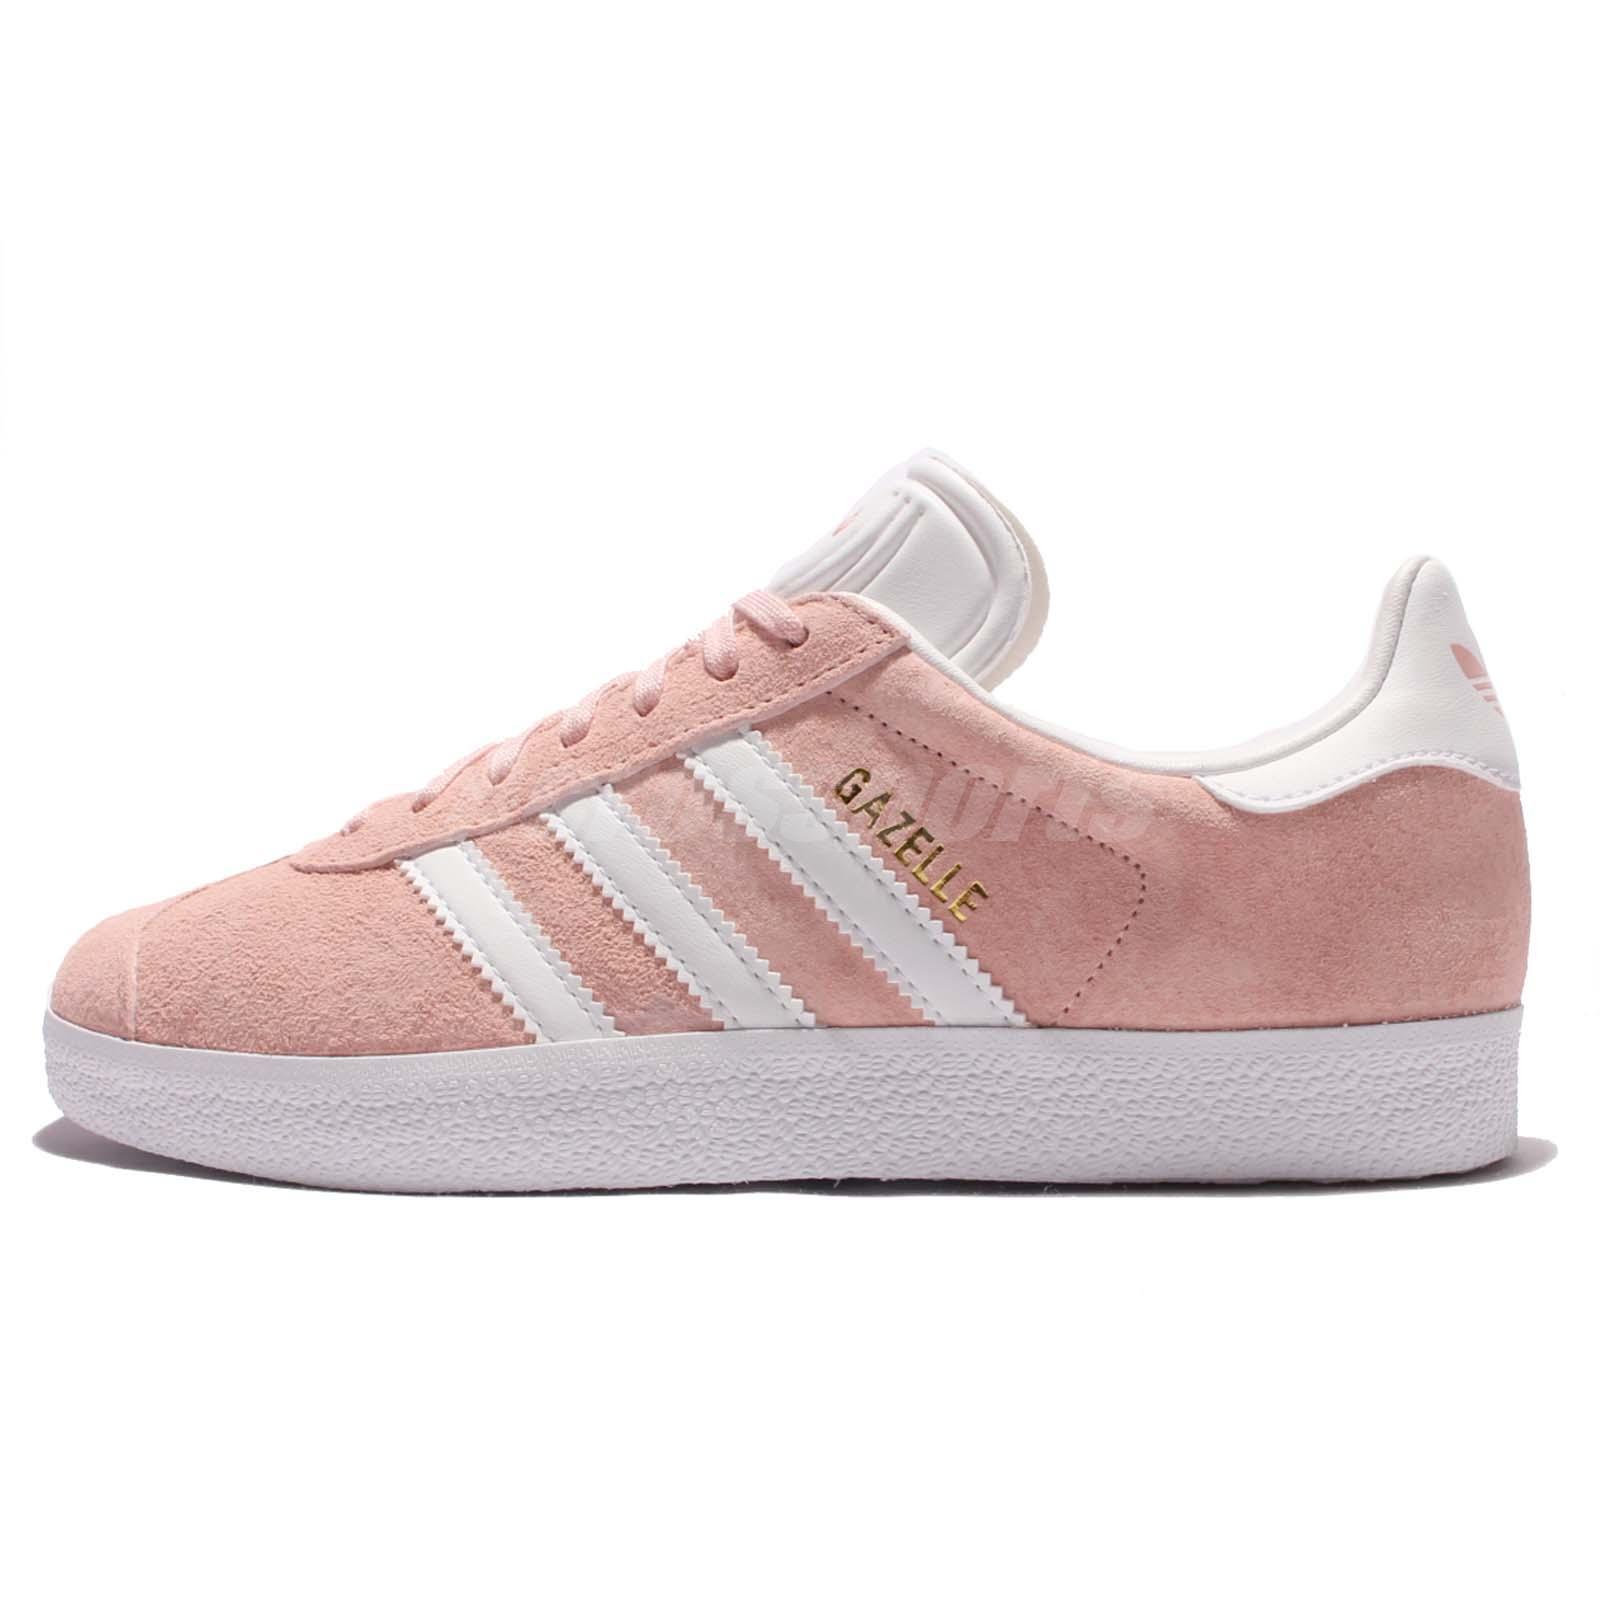 adidas originals footwear gazelle - vapour pink